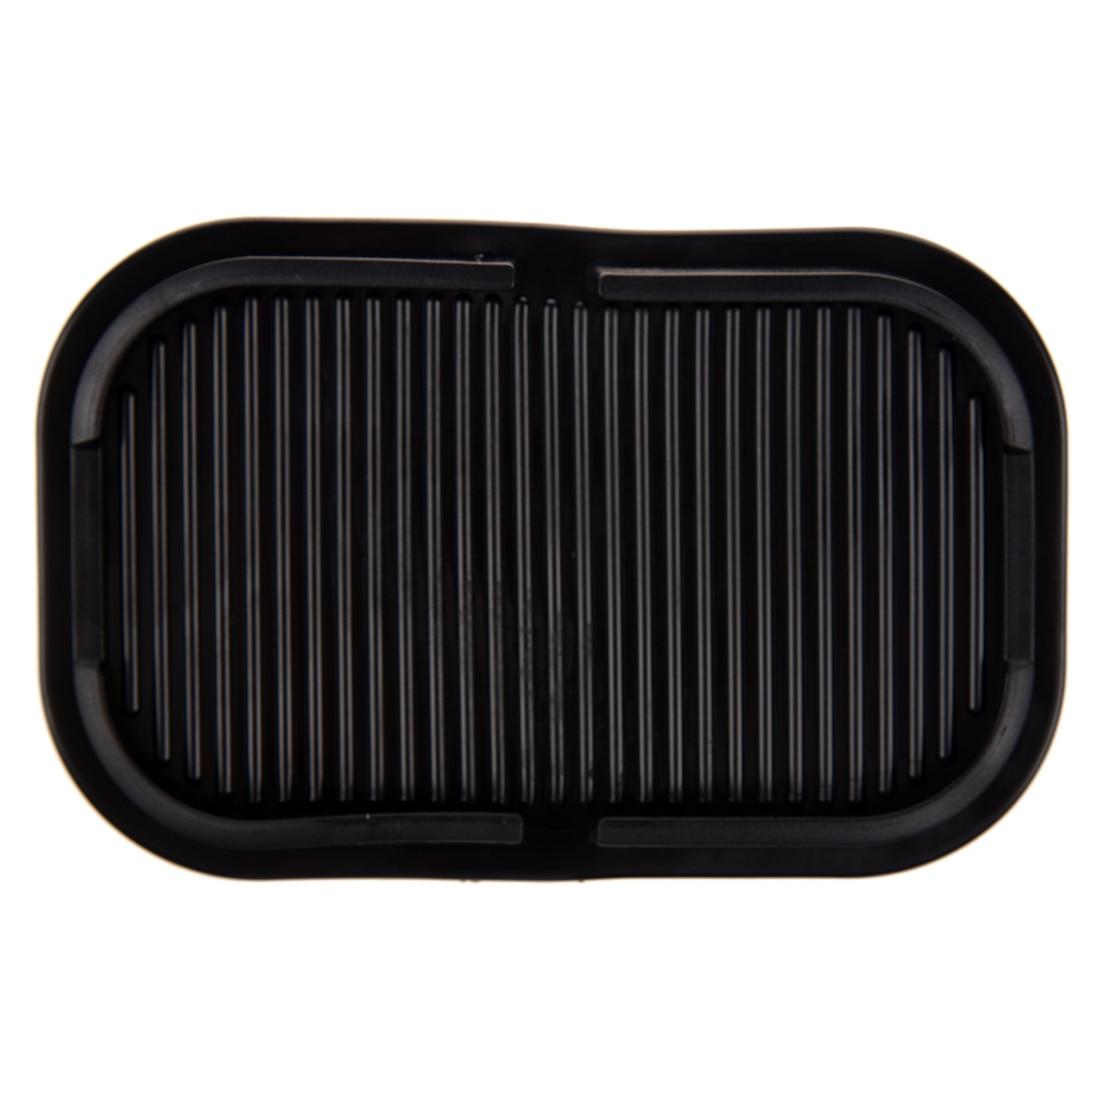 AUTO negro alfombrilla adhesiva para AUTO Mat antideslizante Gadget teléfono móvil titular